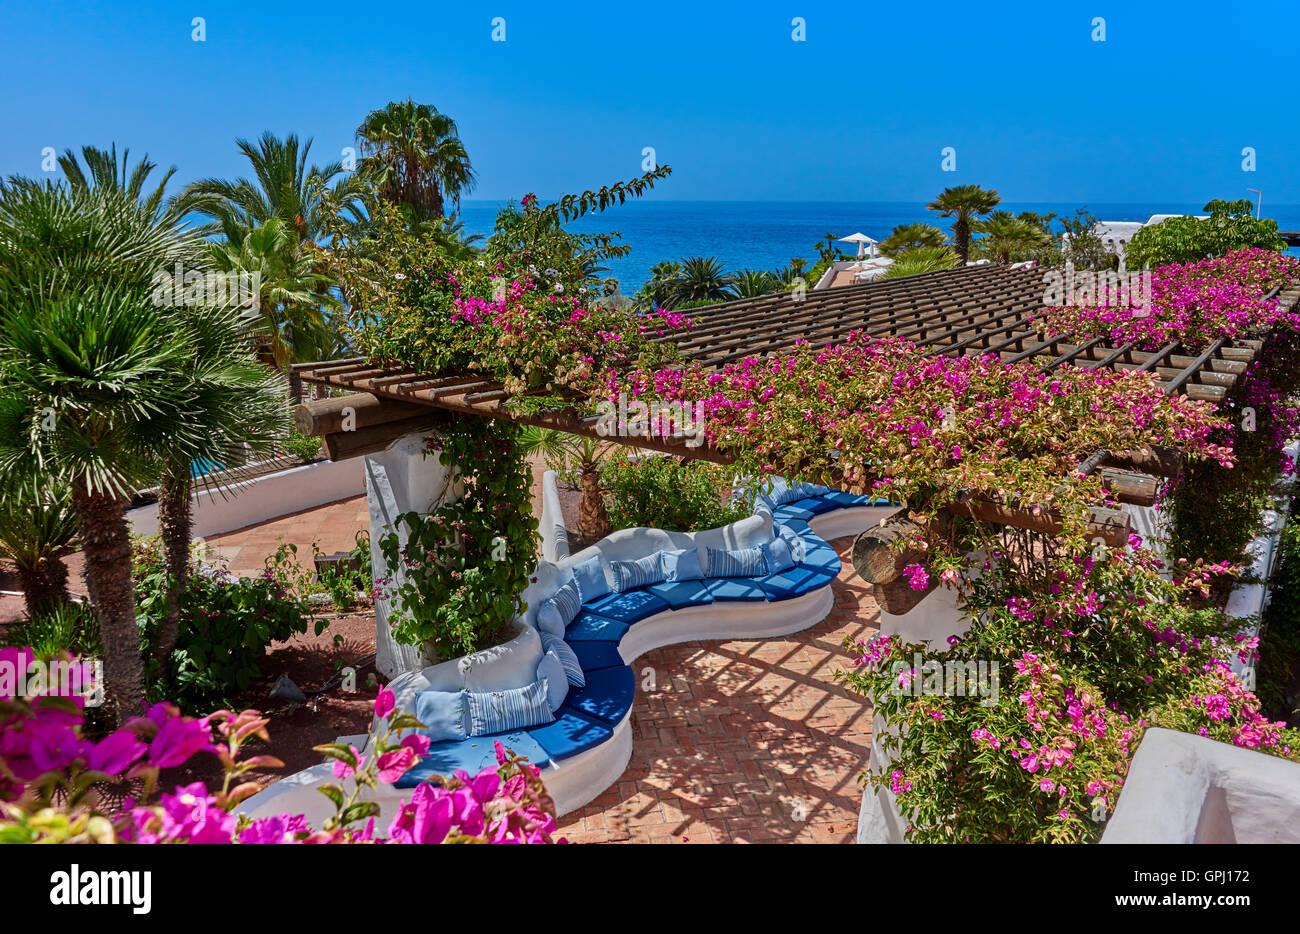 Hotel Jardin Tropical Costa Adeje Tenerife Stock Photo 117180758